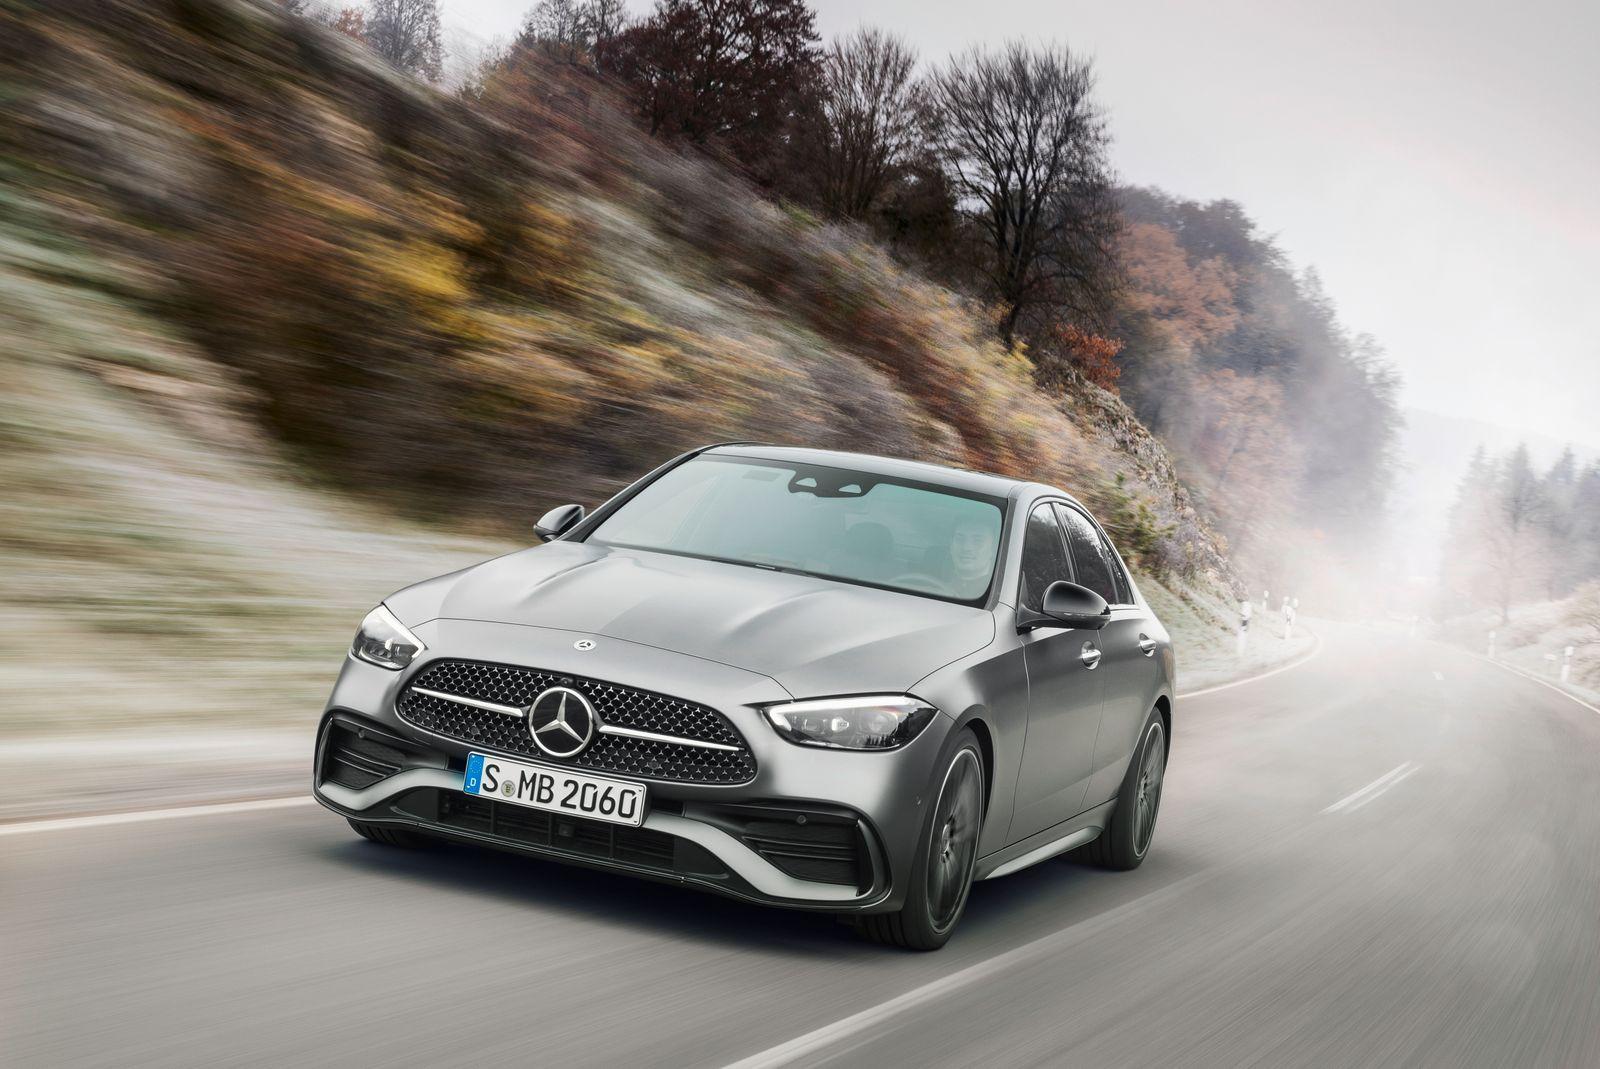 PAD/Embargo Digital World Premiere: Tuesday, February 23rd 14:00 Uhr (MEZ) Mercedes-Benz C-Klasse, 2021 // Mercedes-Benz C-Class, 2021